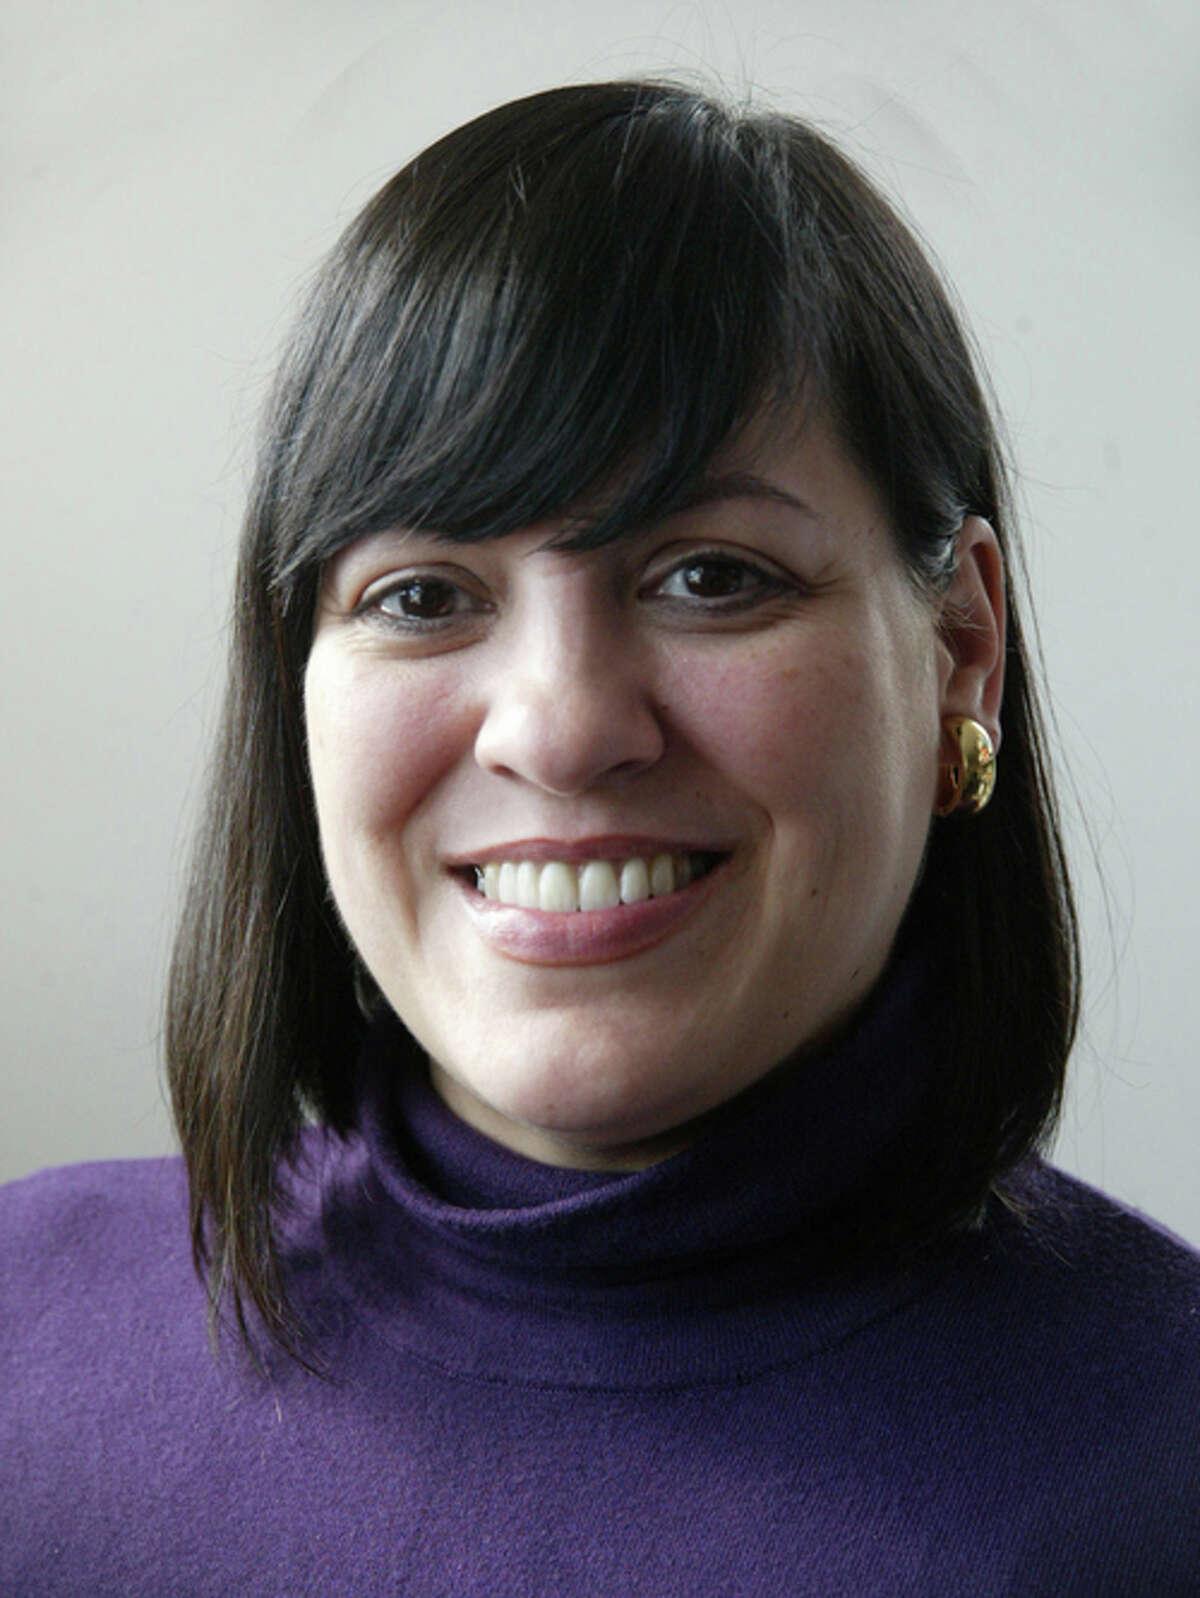 Former Bridgeport Board of Education member Maria Pereira